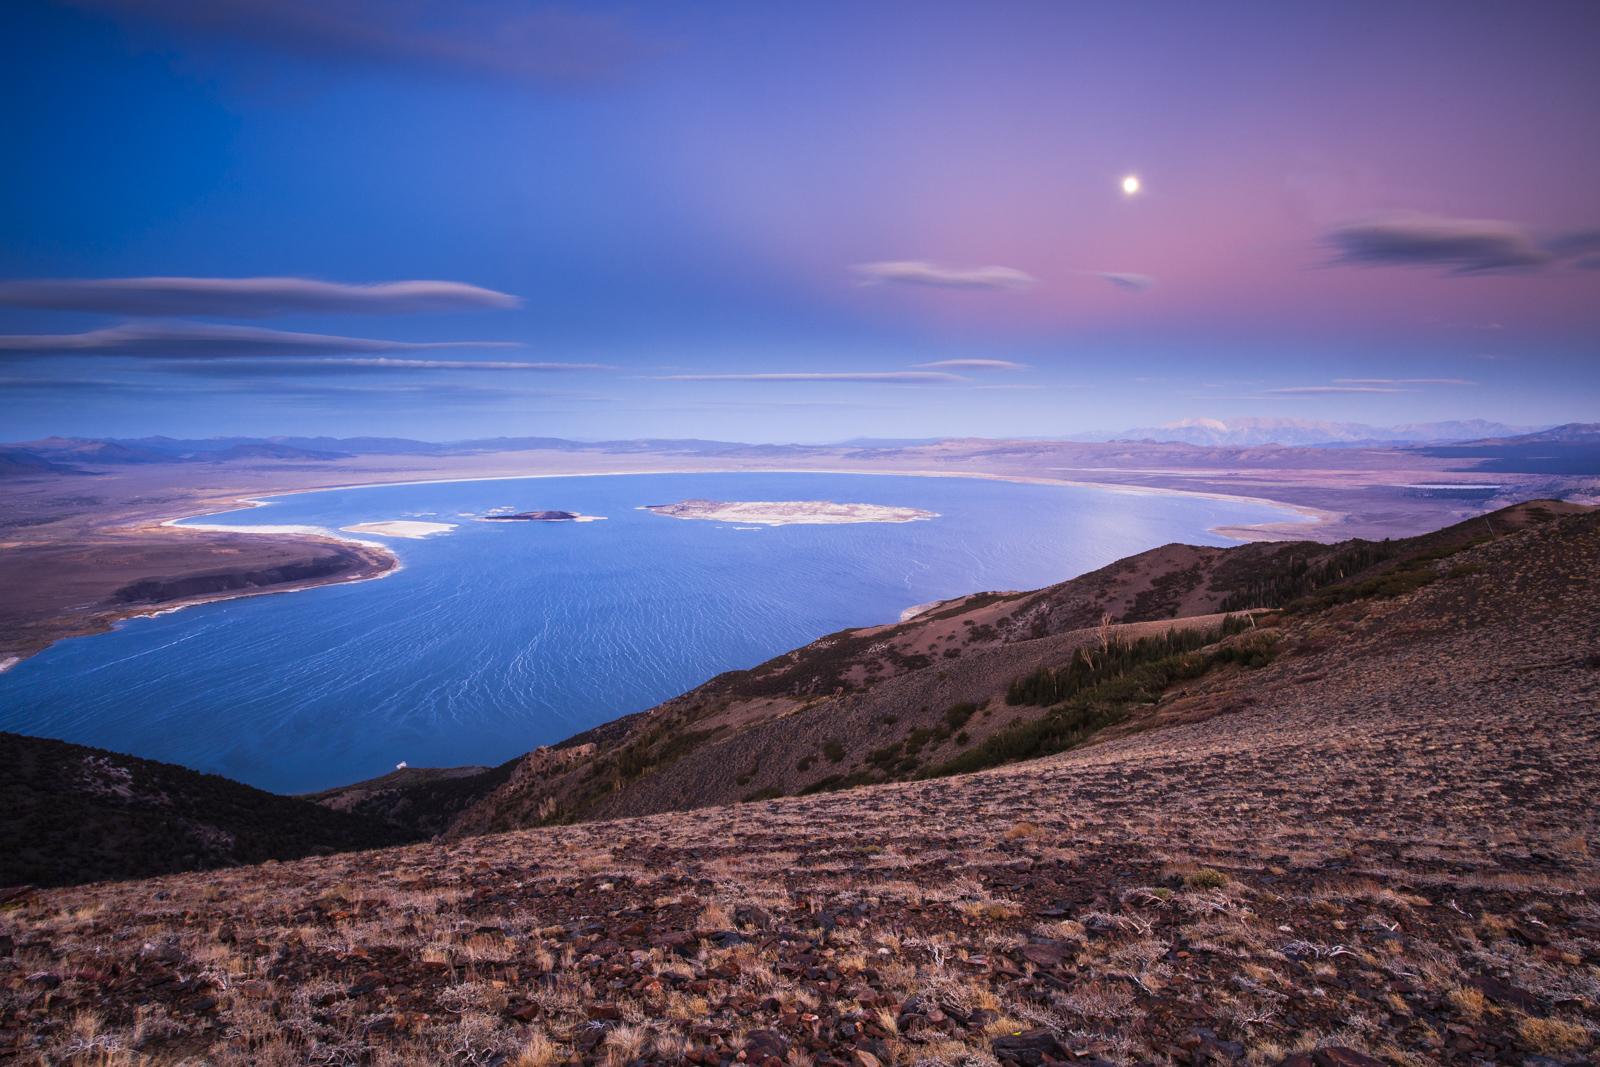 California, Mono Basin, North America, Owens Valley, USA, moon, photo